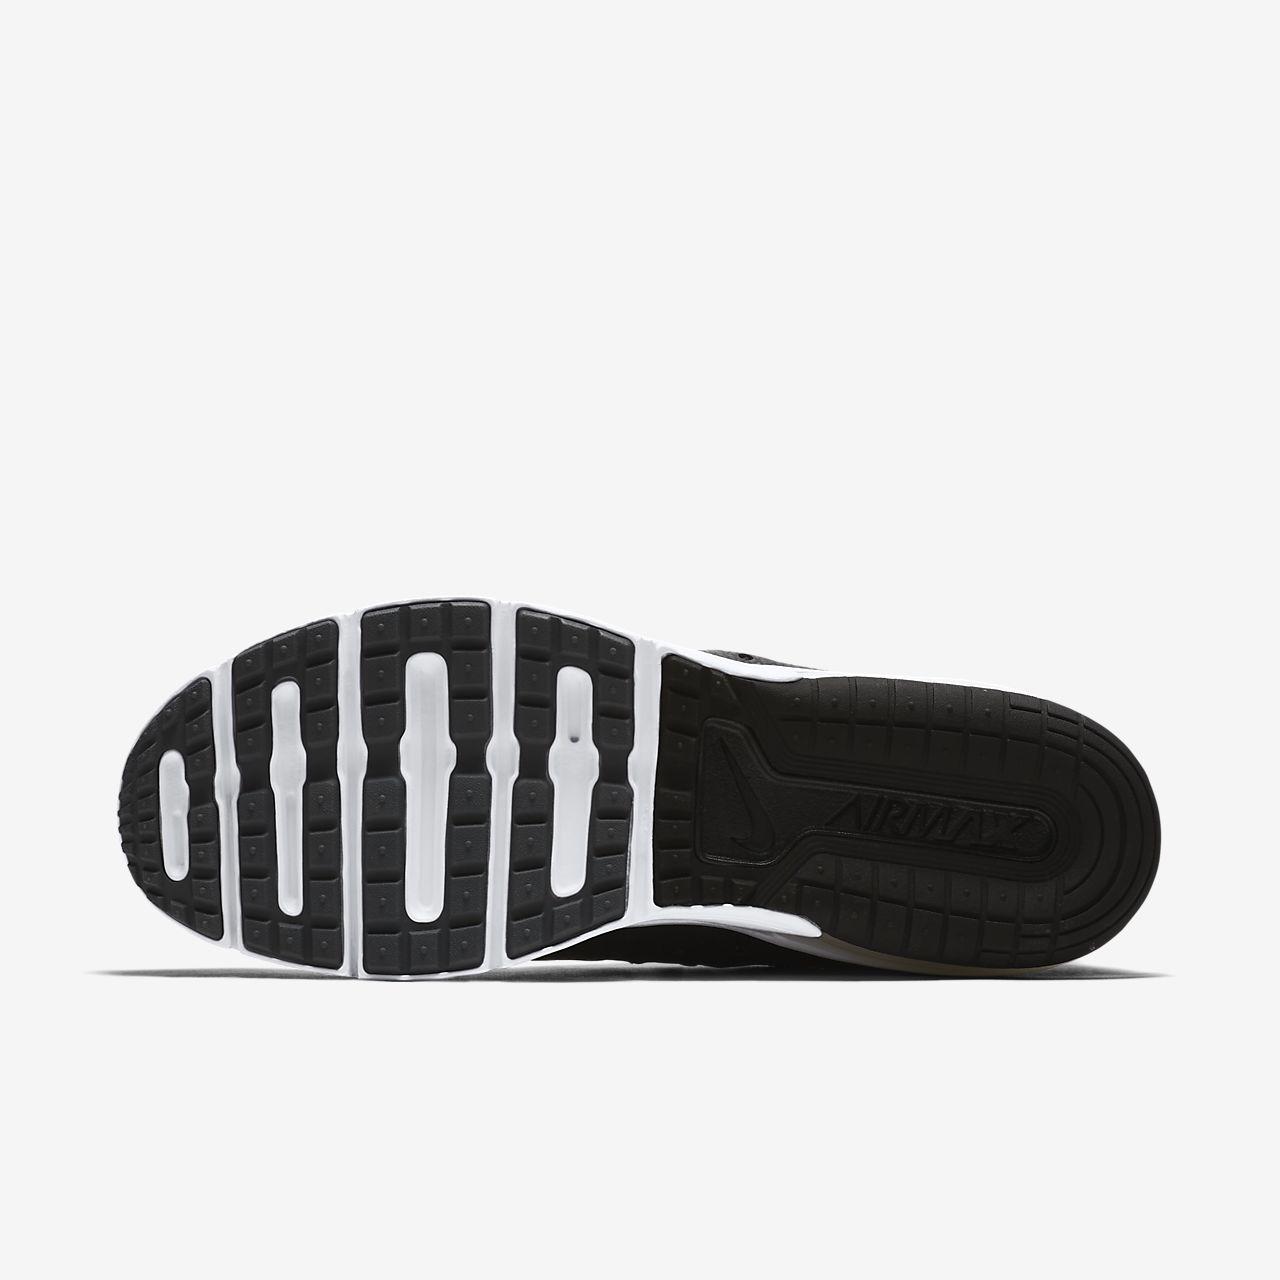 22be1c6688 Nike Air Max Sequent 3 Women's Shoe. Nike.com AU